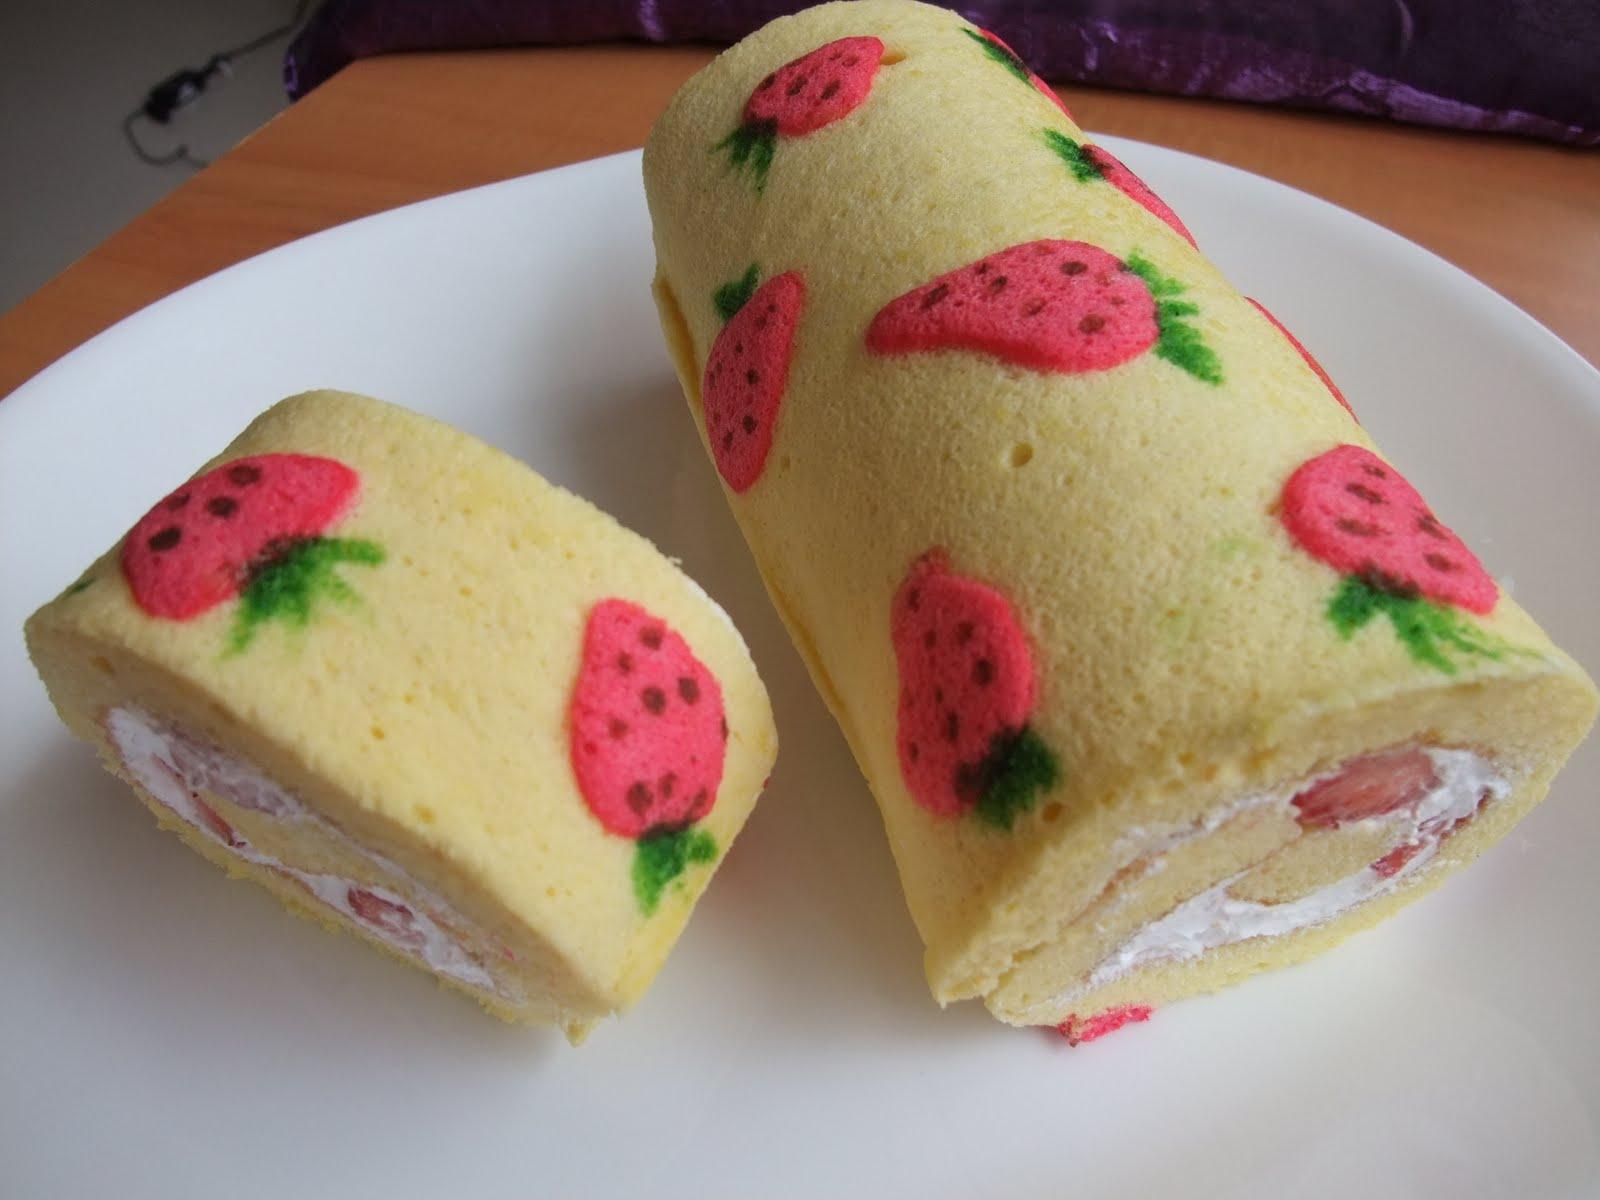 Veronica S Kitchen Creative Strawberry Swiss Roll